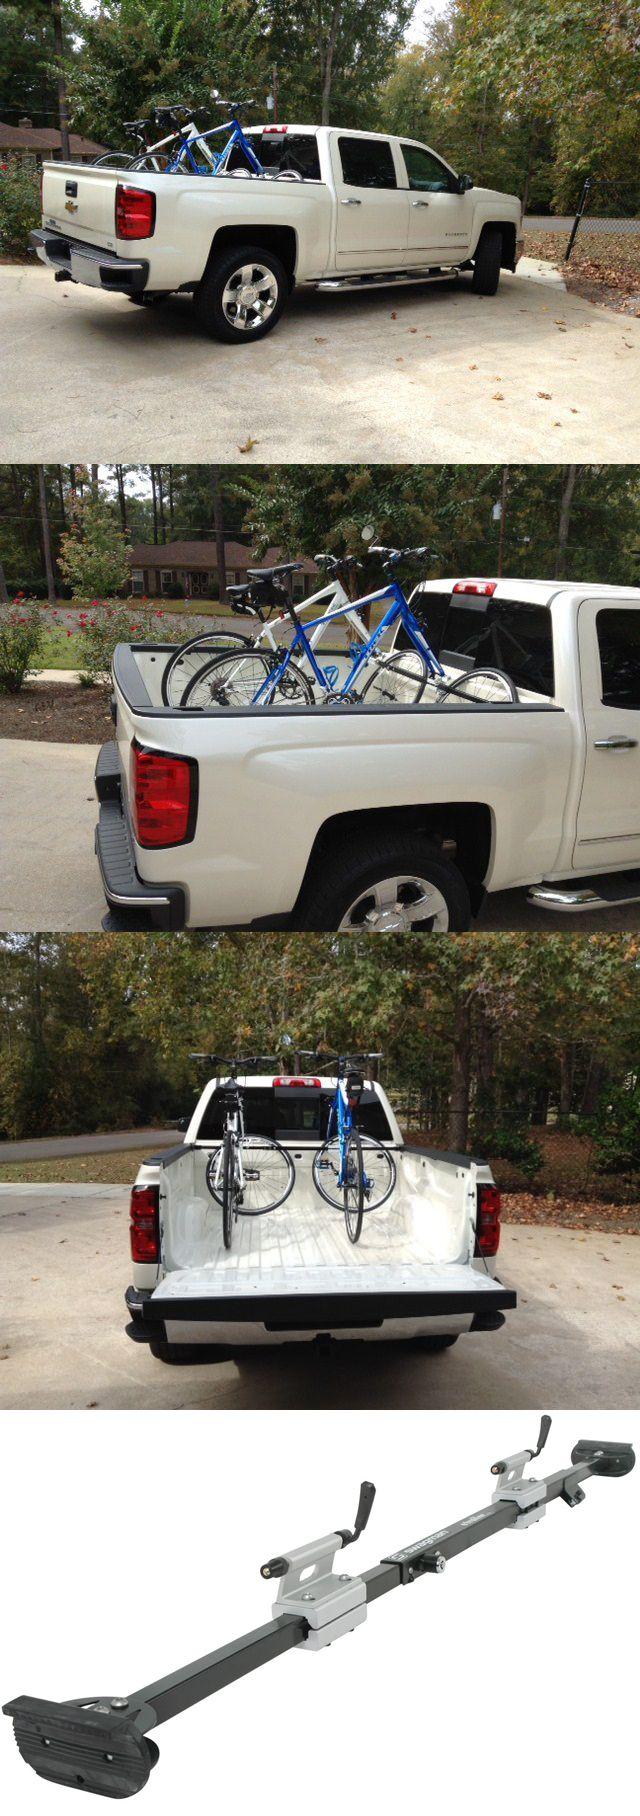 Weathertech floor mats grand forks - Swagman Pick Up Truck Bed Mounted 2 Bike Carrier Locking Fork Mount Swagman Truck Bed Bike Racks S64702